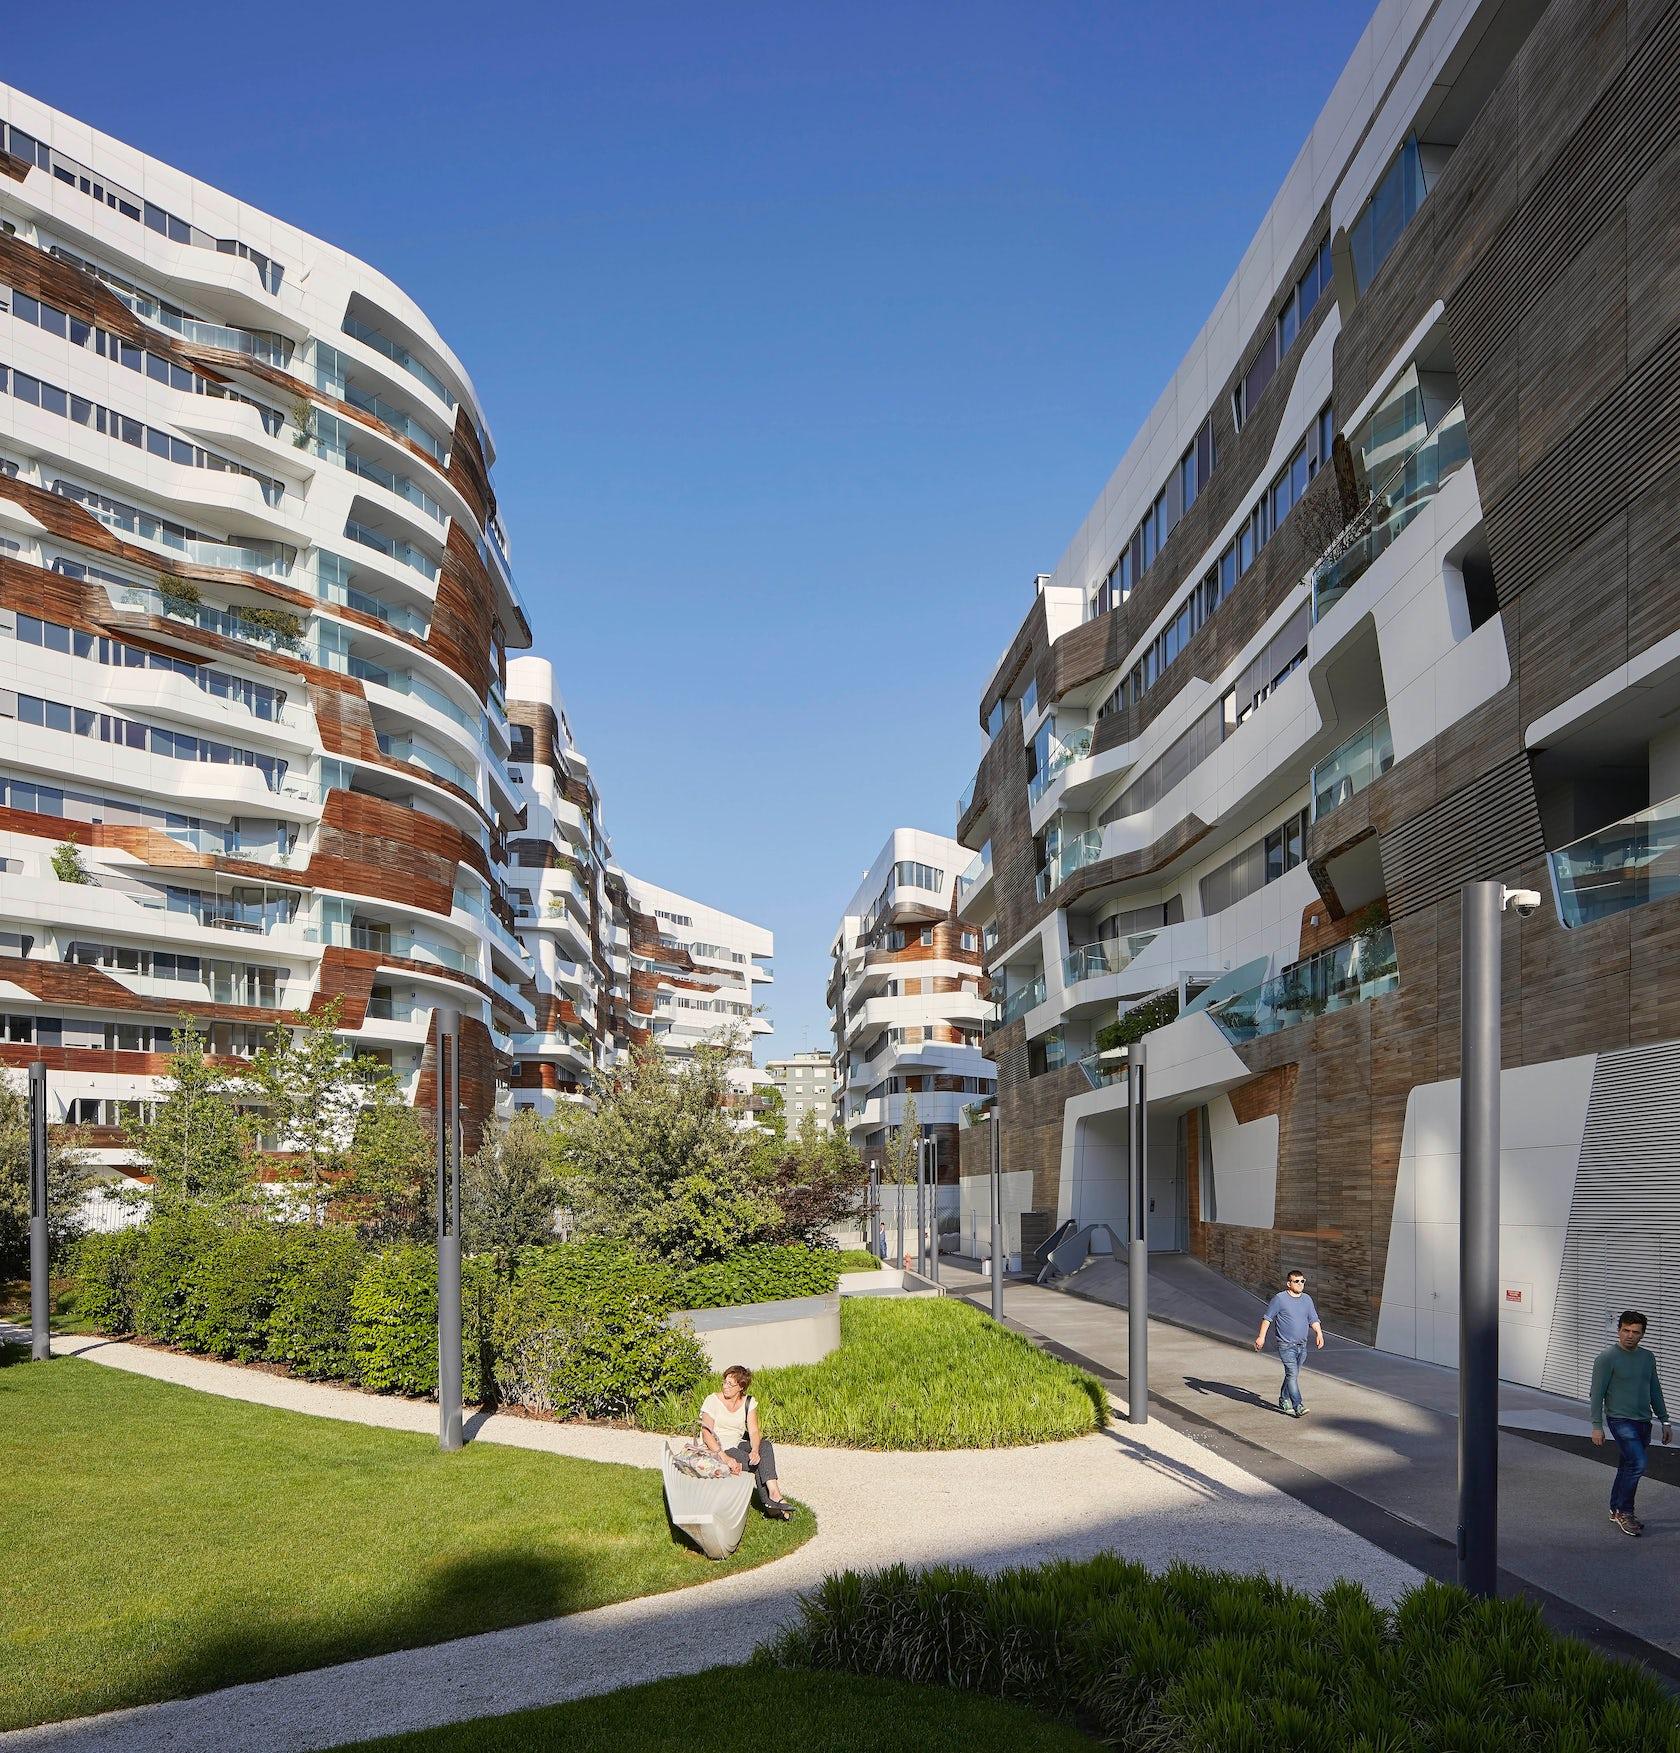 City life milano residential complex architizer for Prezzi city life milano